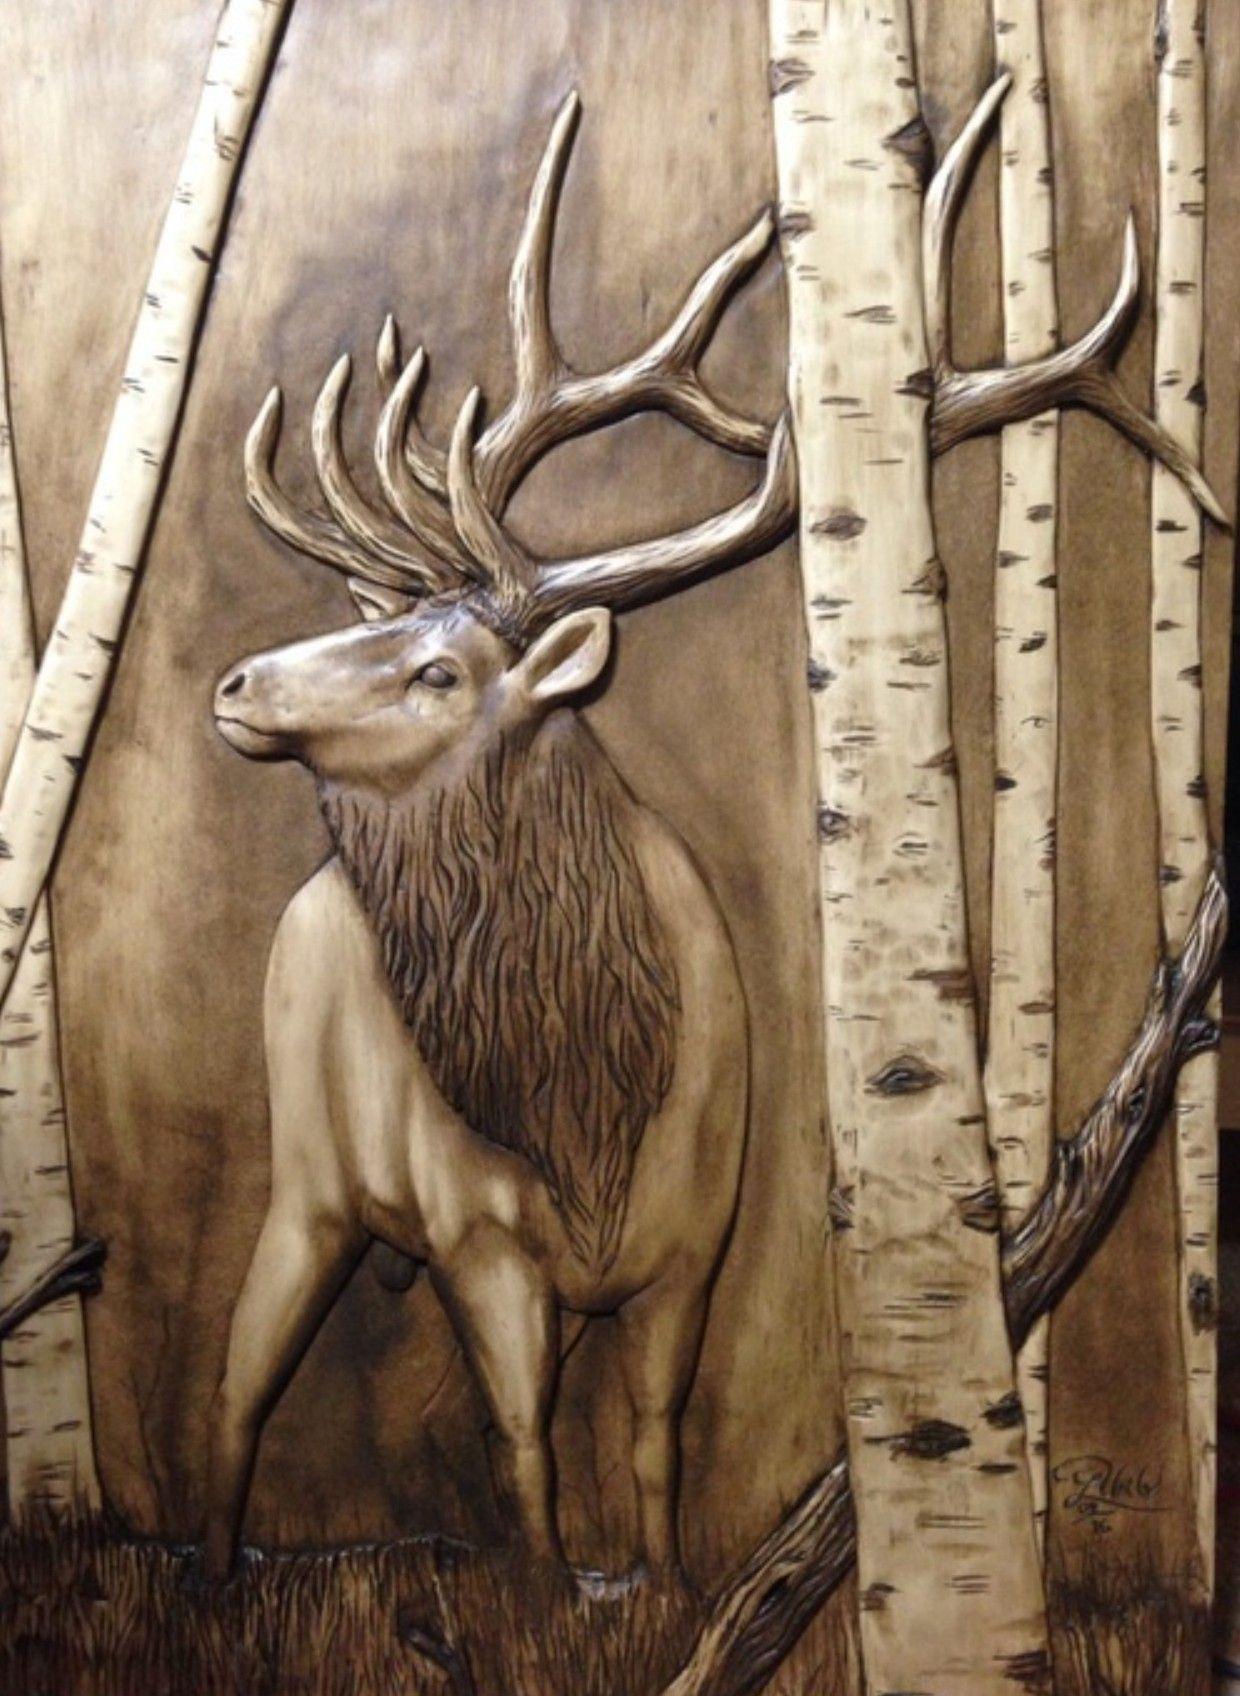 Pin By Jaime Villar On Macizo - Pinterest - Wood